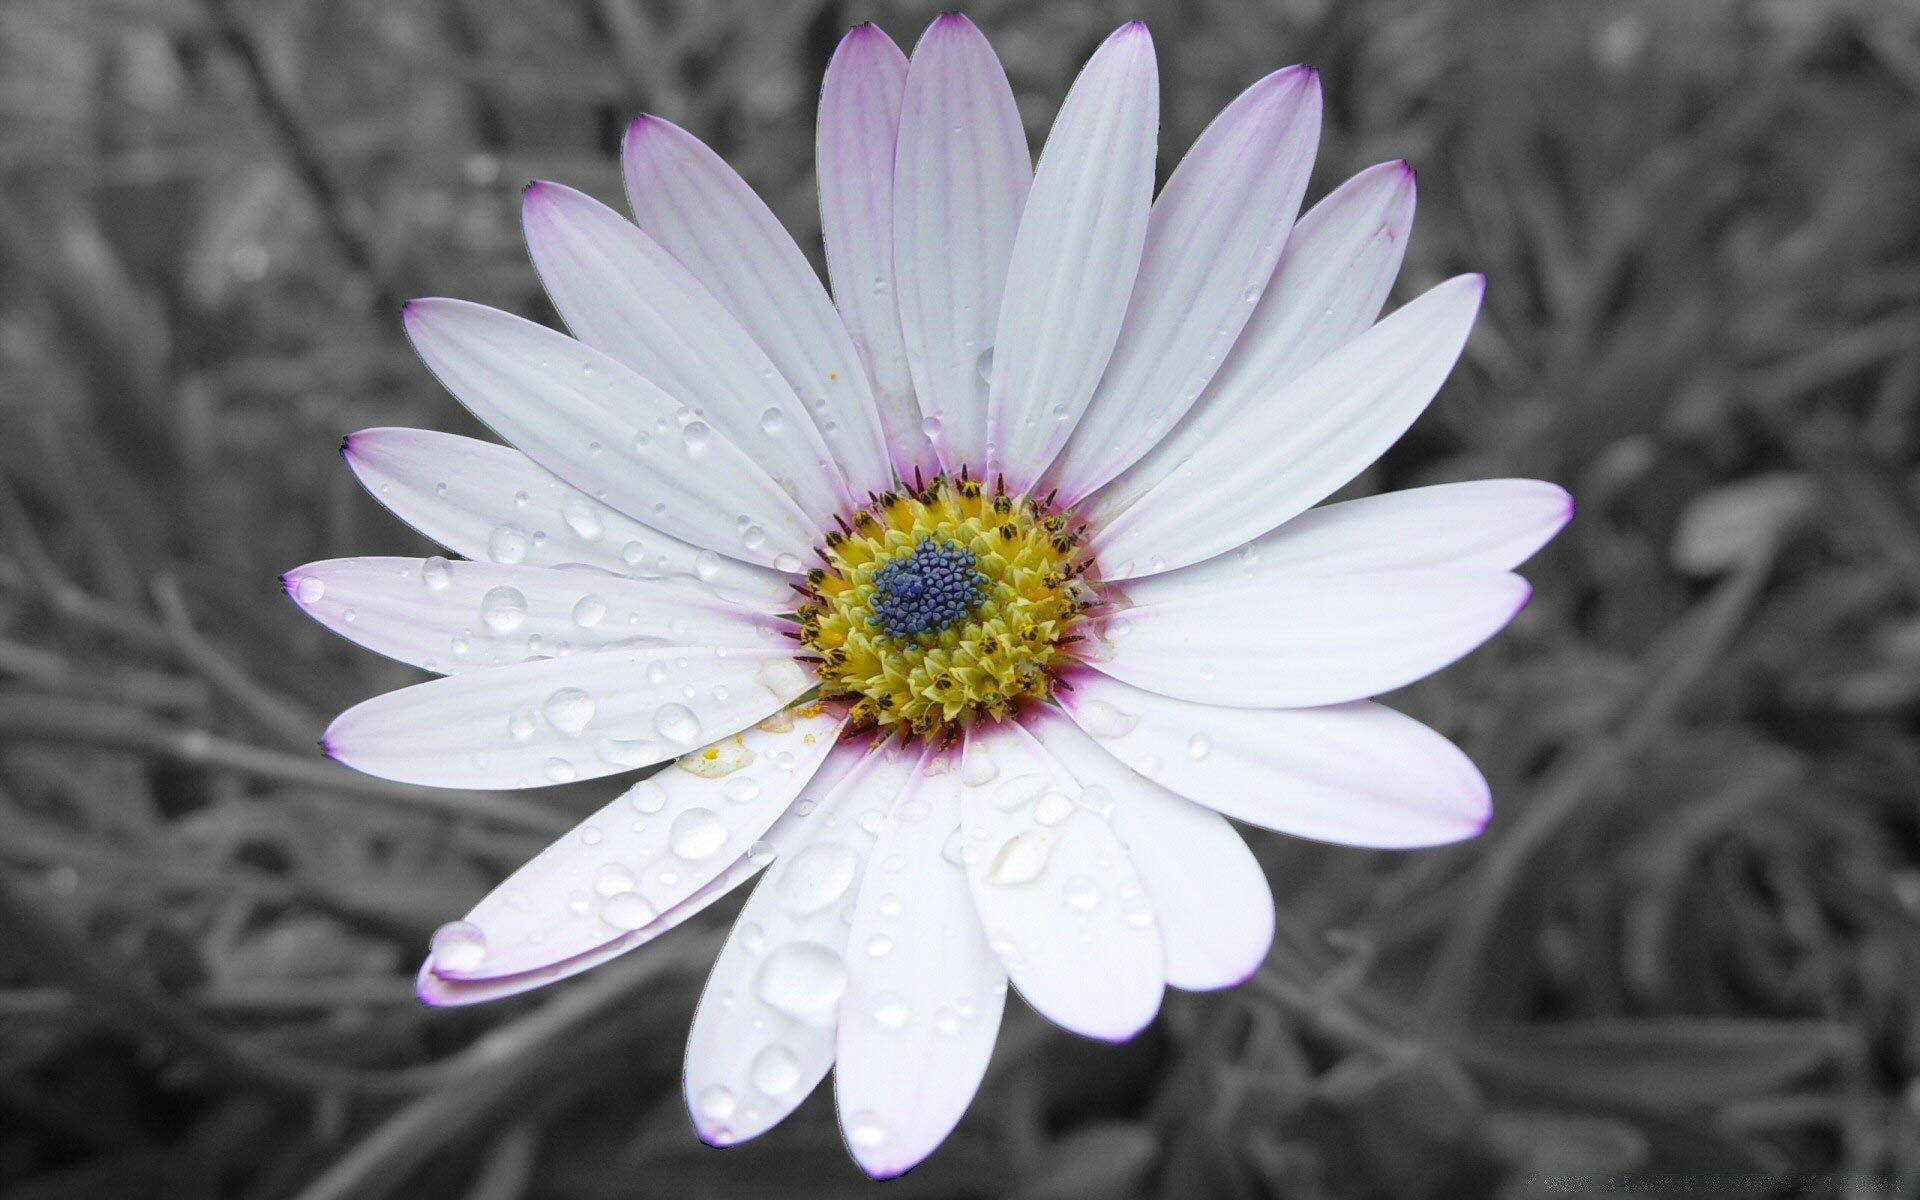 ромашки розовые белые chamomile pink white  № 1037984 загрузить